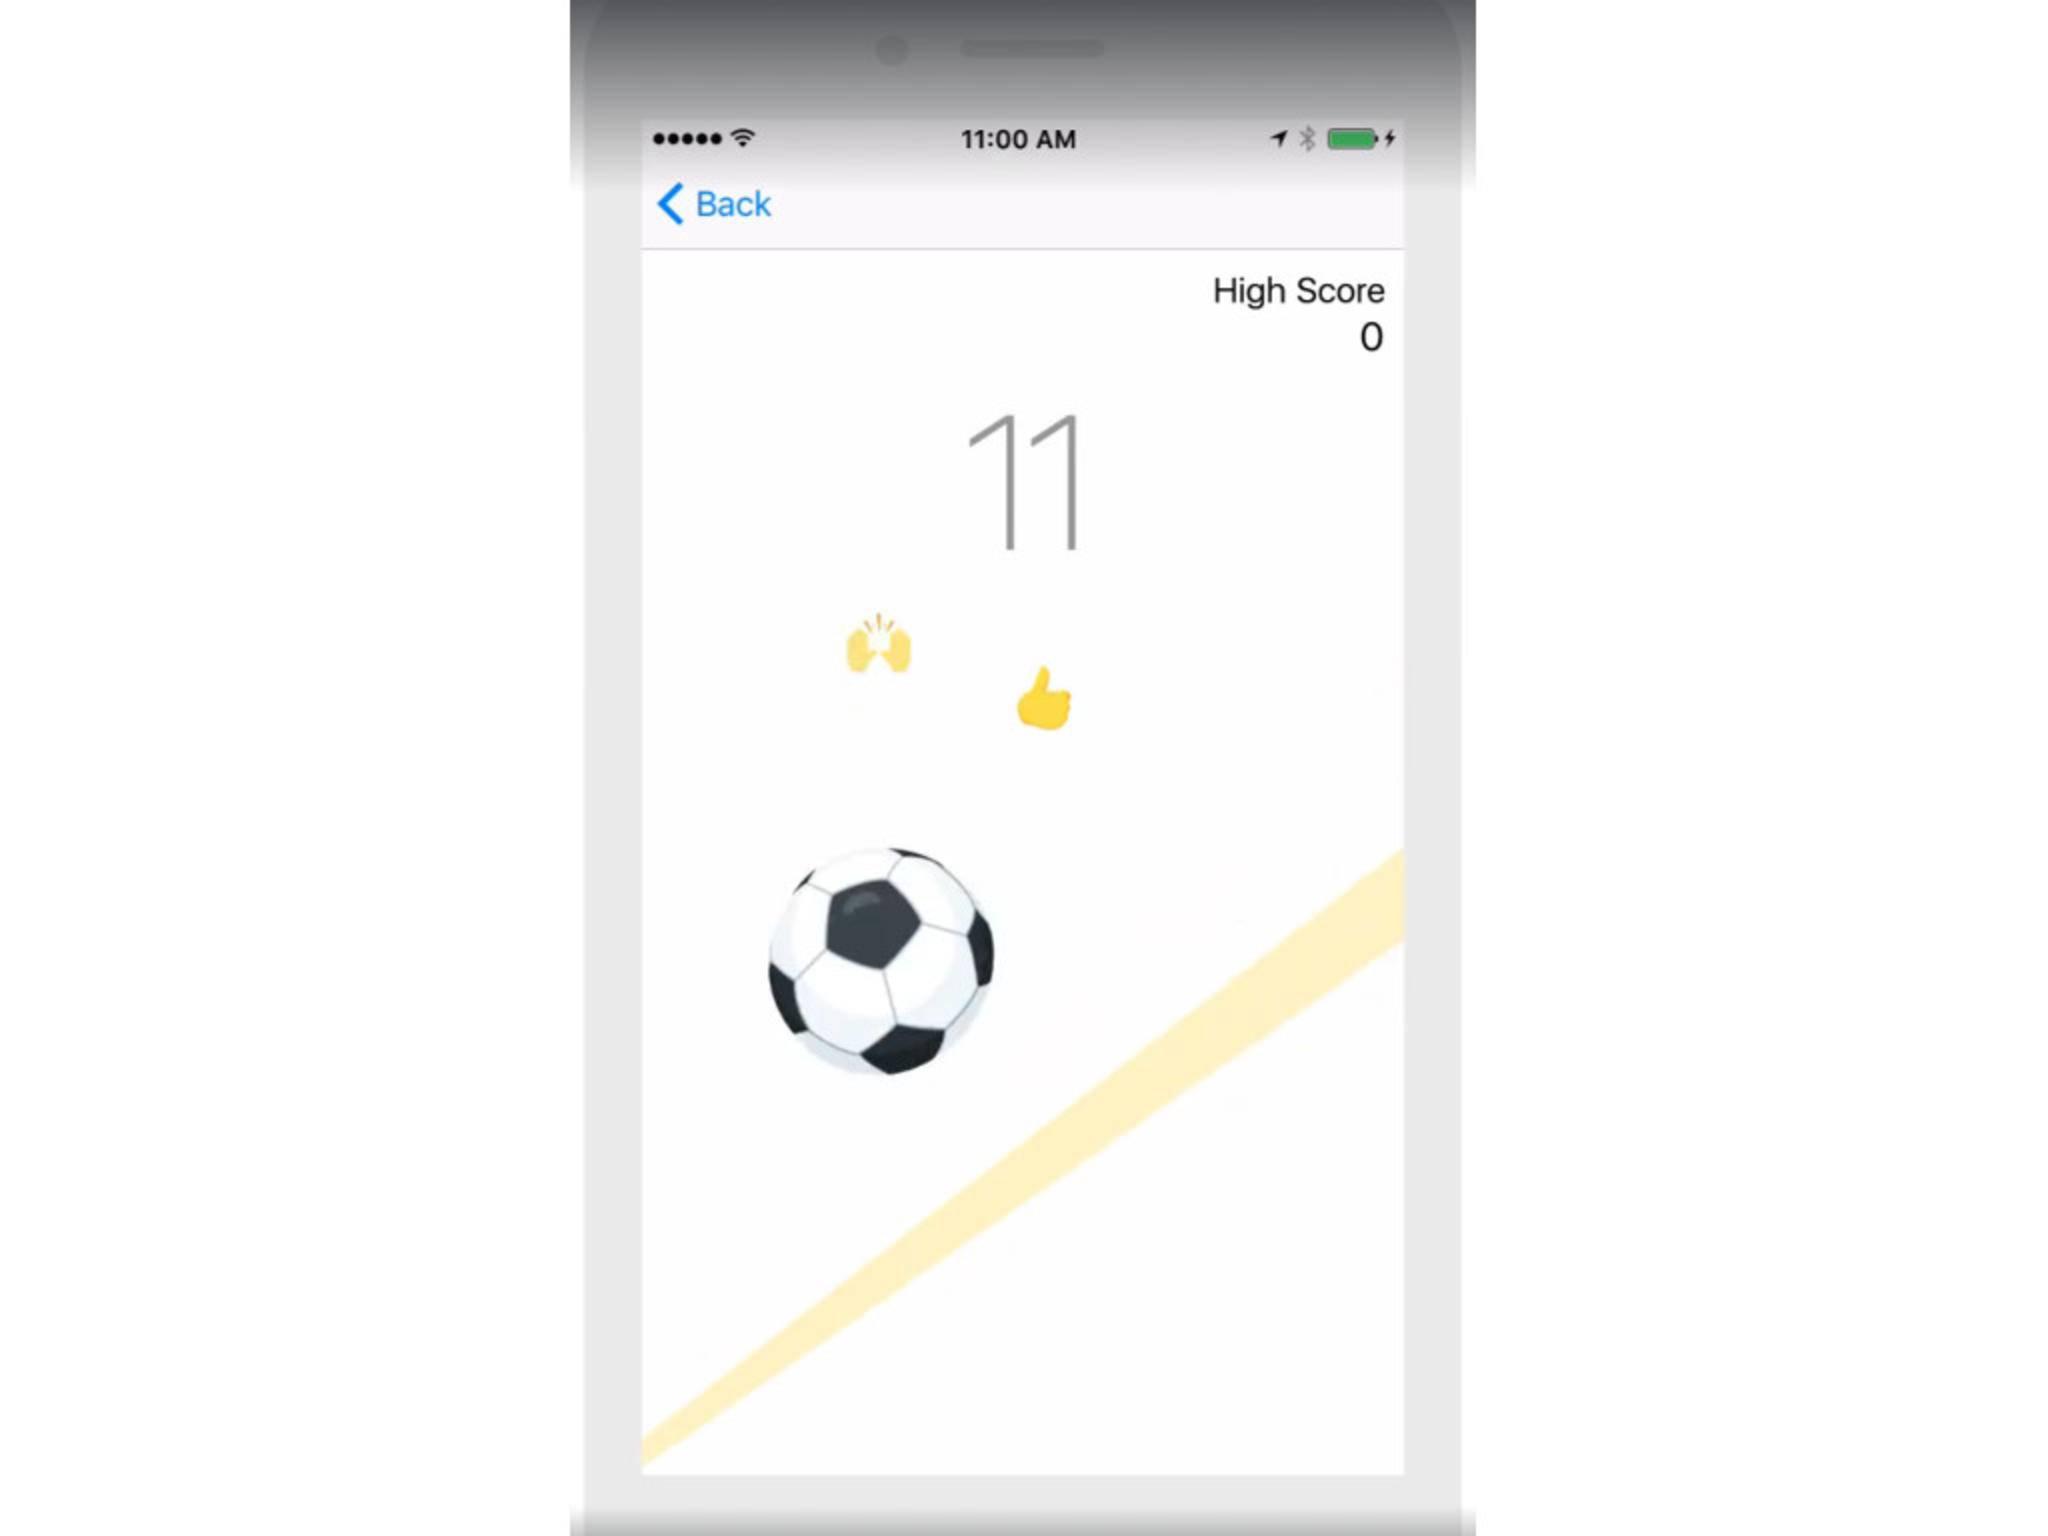 Facebook Messenger Fußball Mini-Game